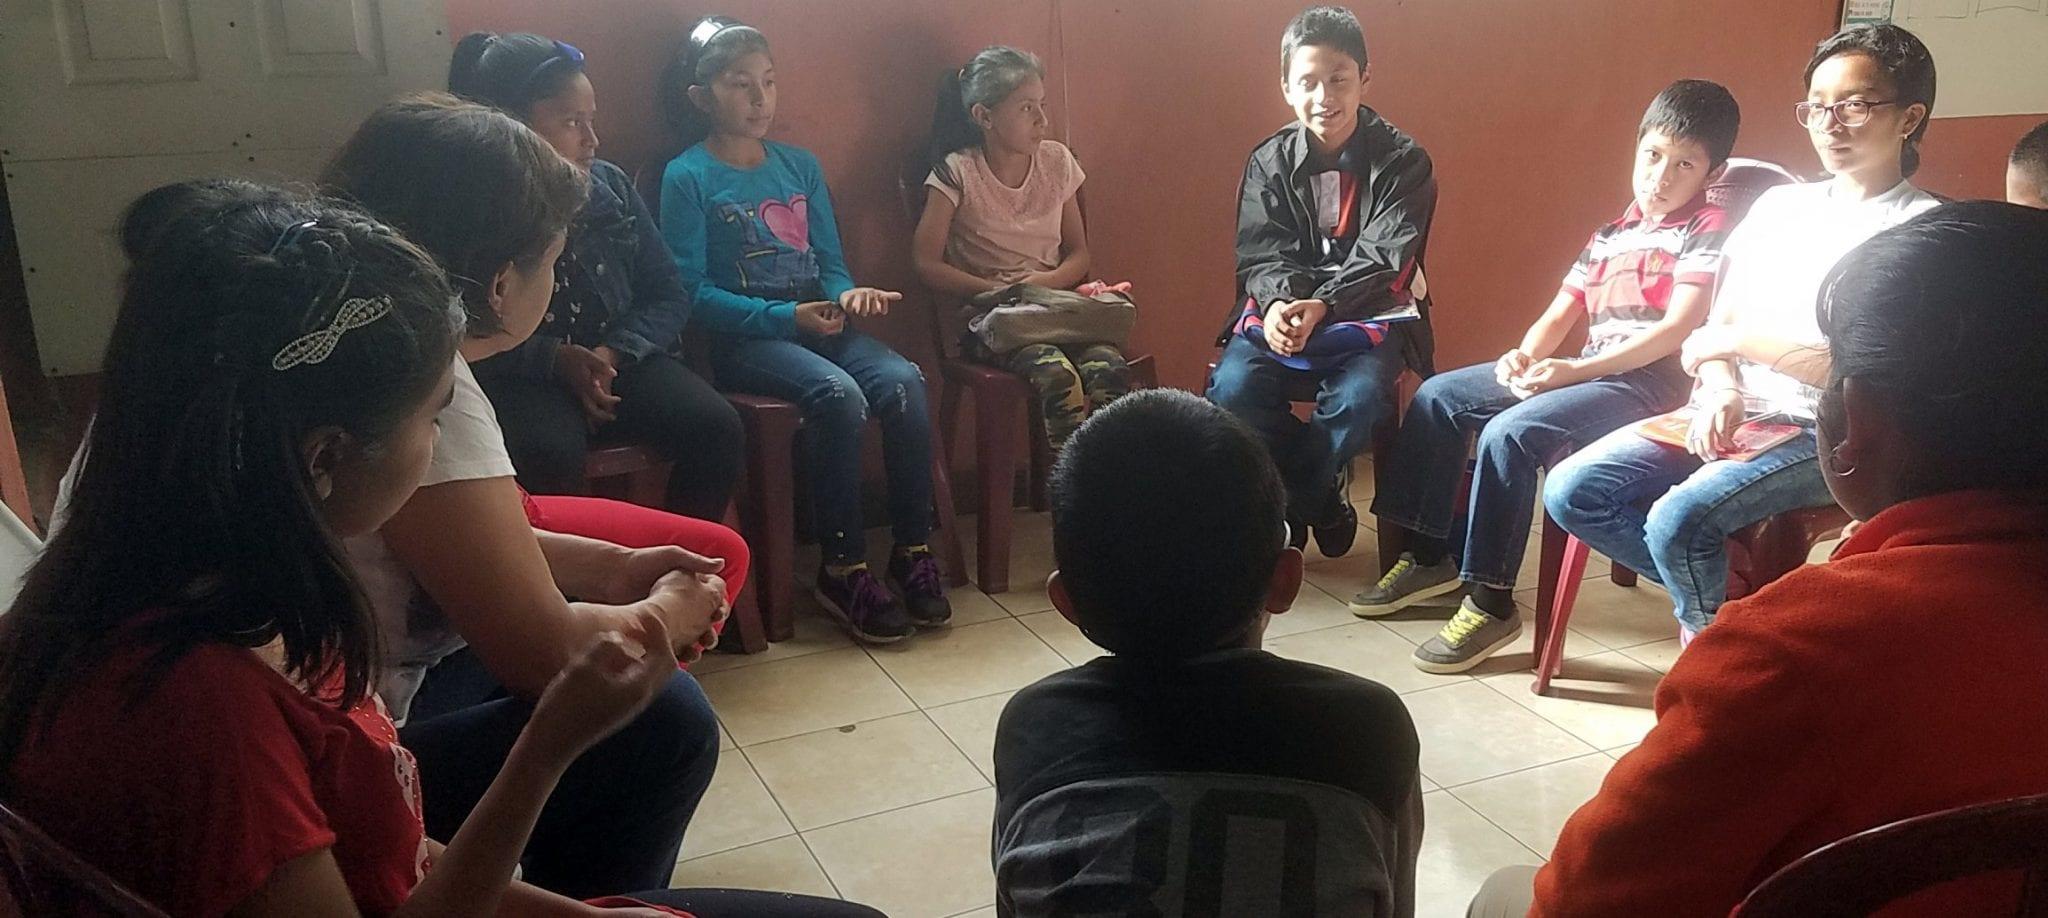 Bible classes